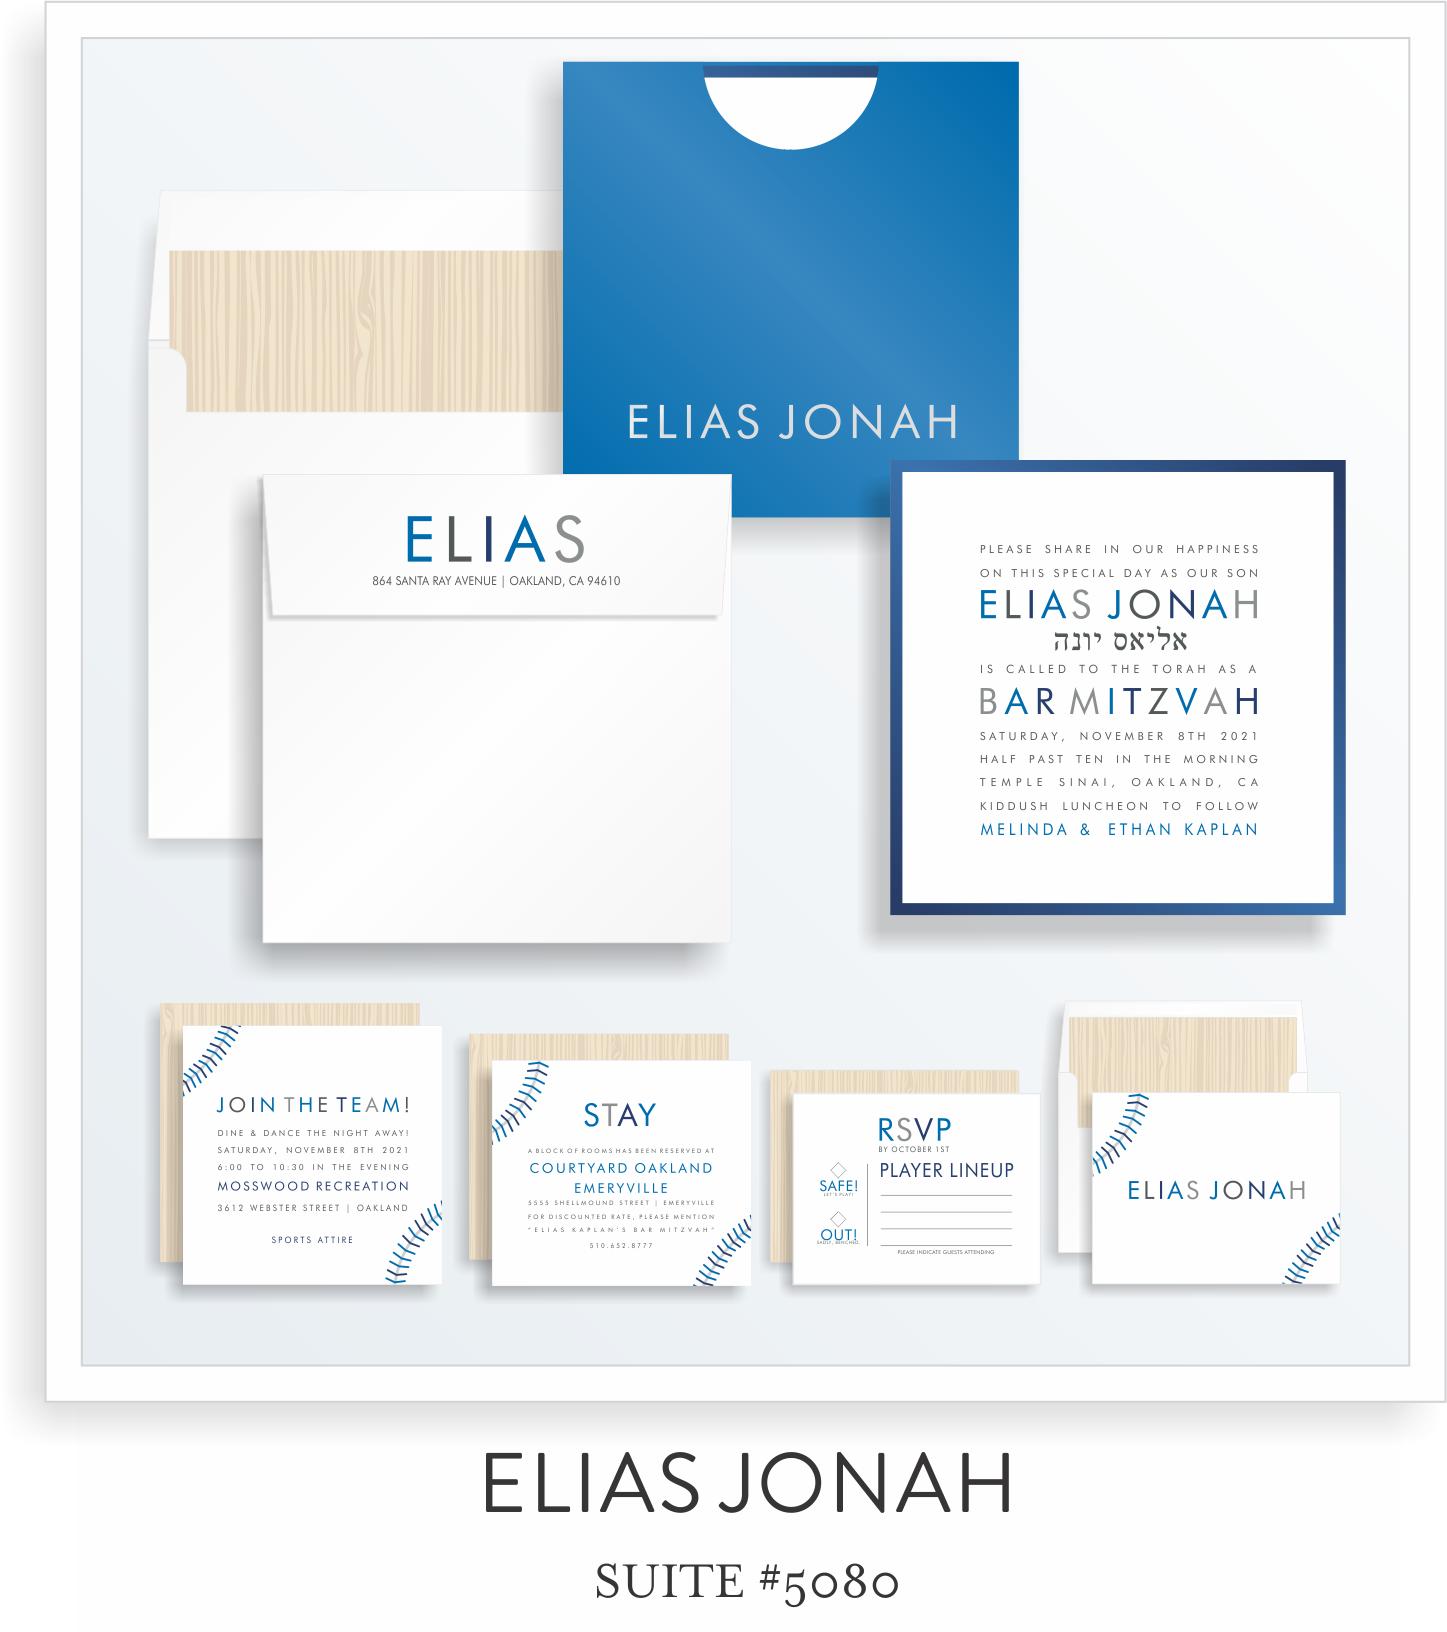 5080 ELIAS JONAH SUITE THUMB